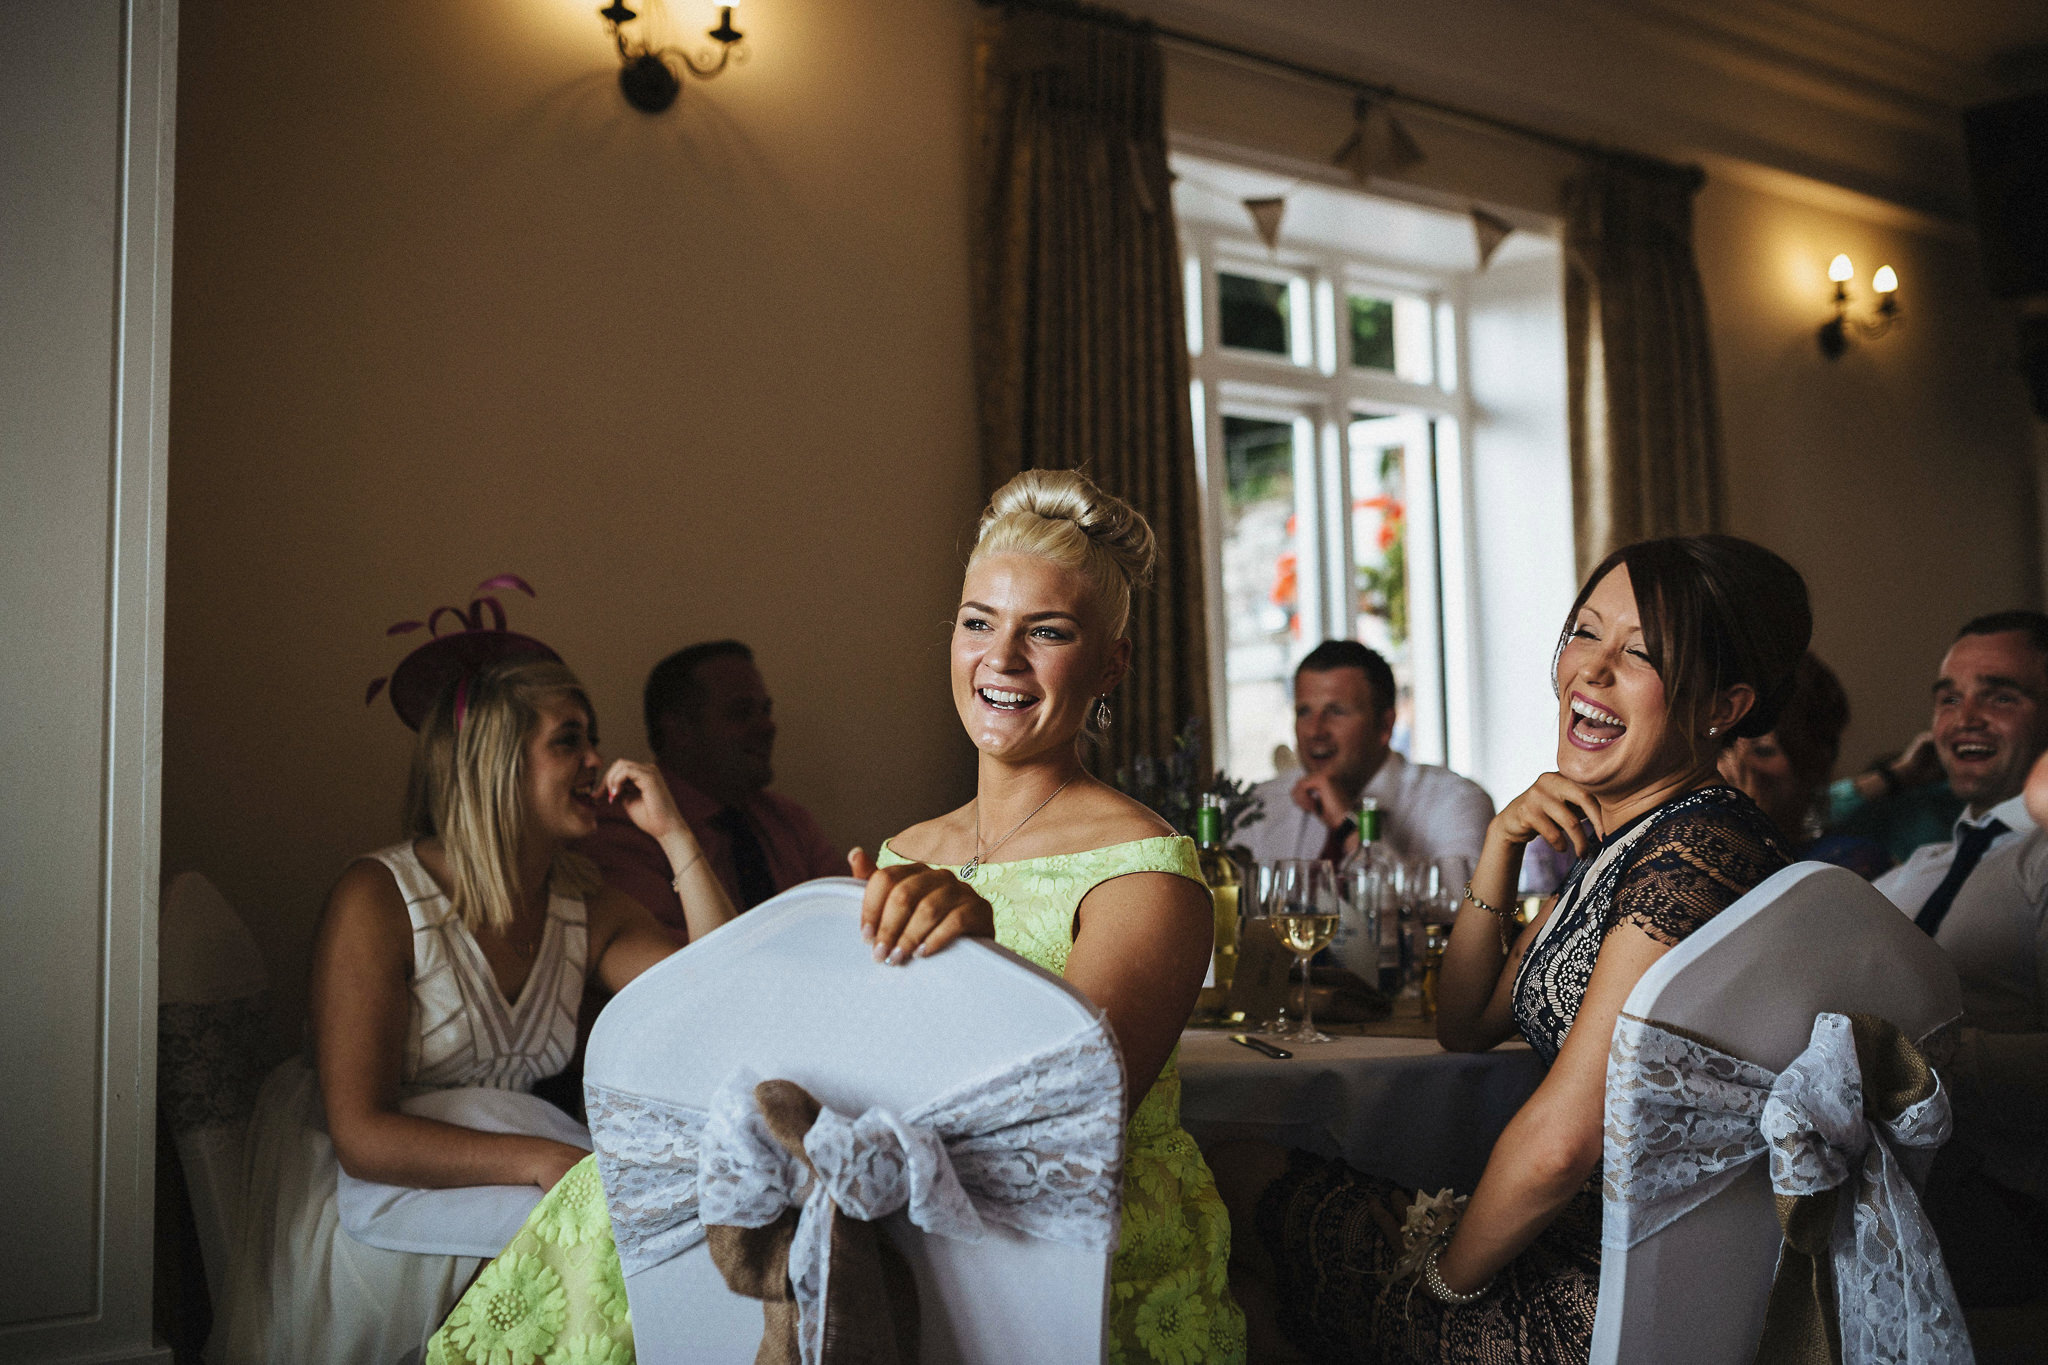 paul-marbrook-Caer-Llan-Wedding-Photographer-90075